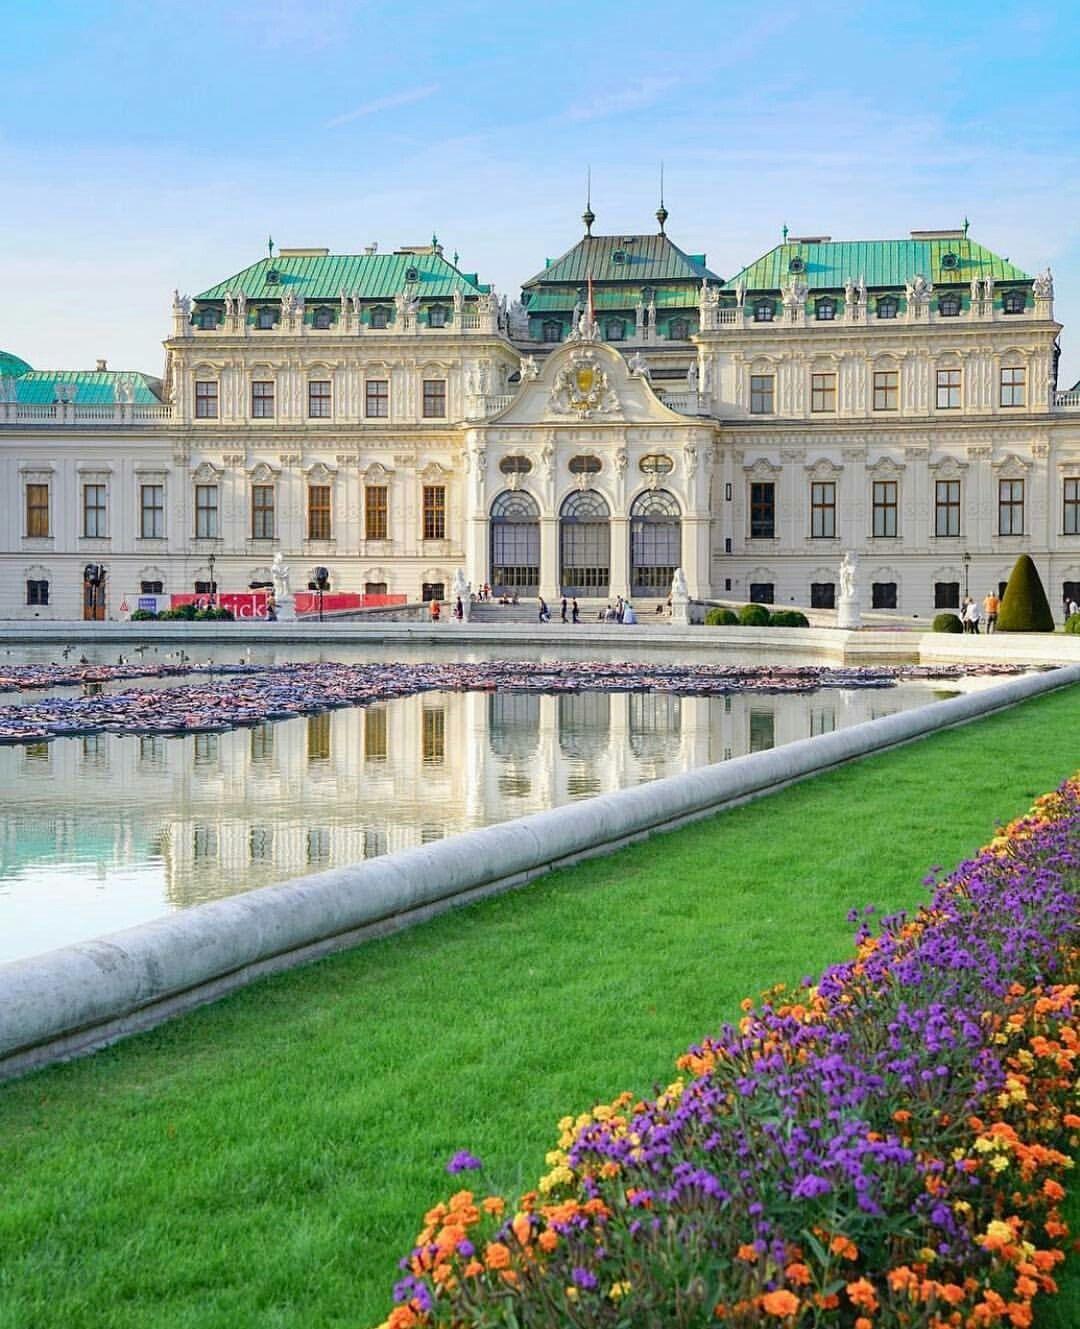 дворцы австрии картинки степени